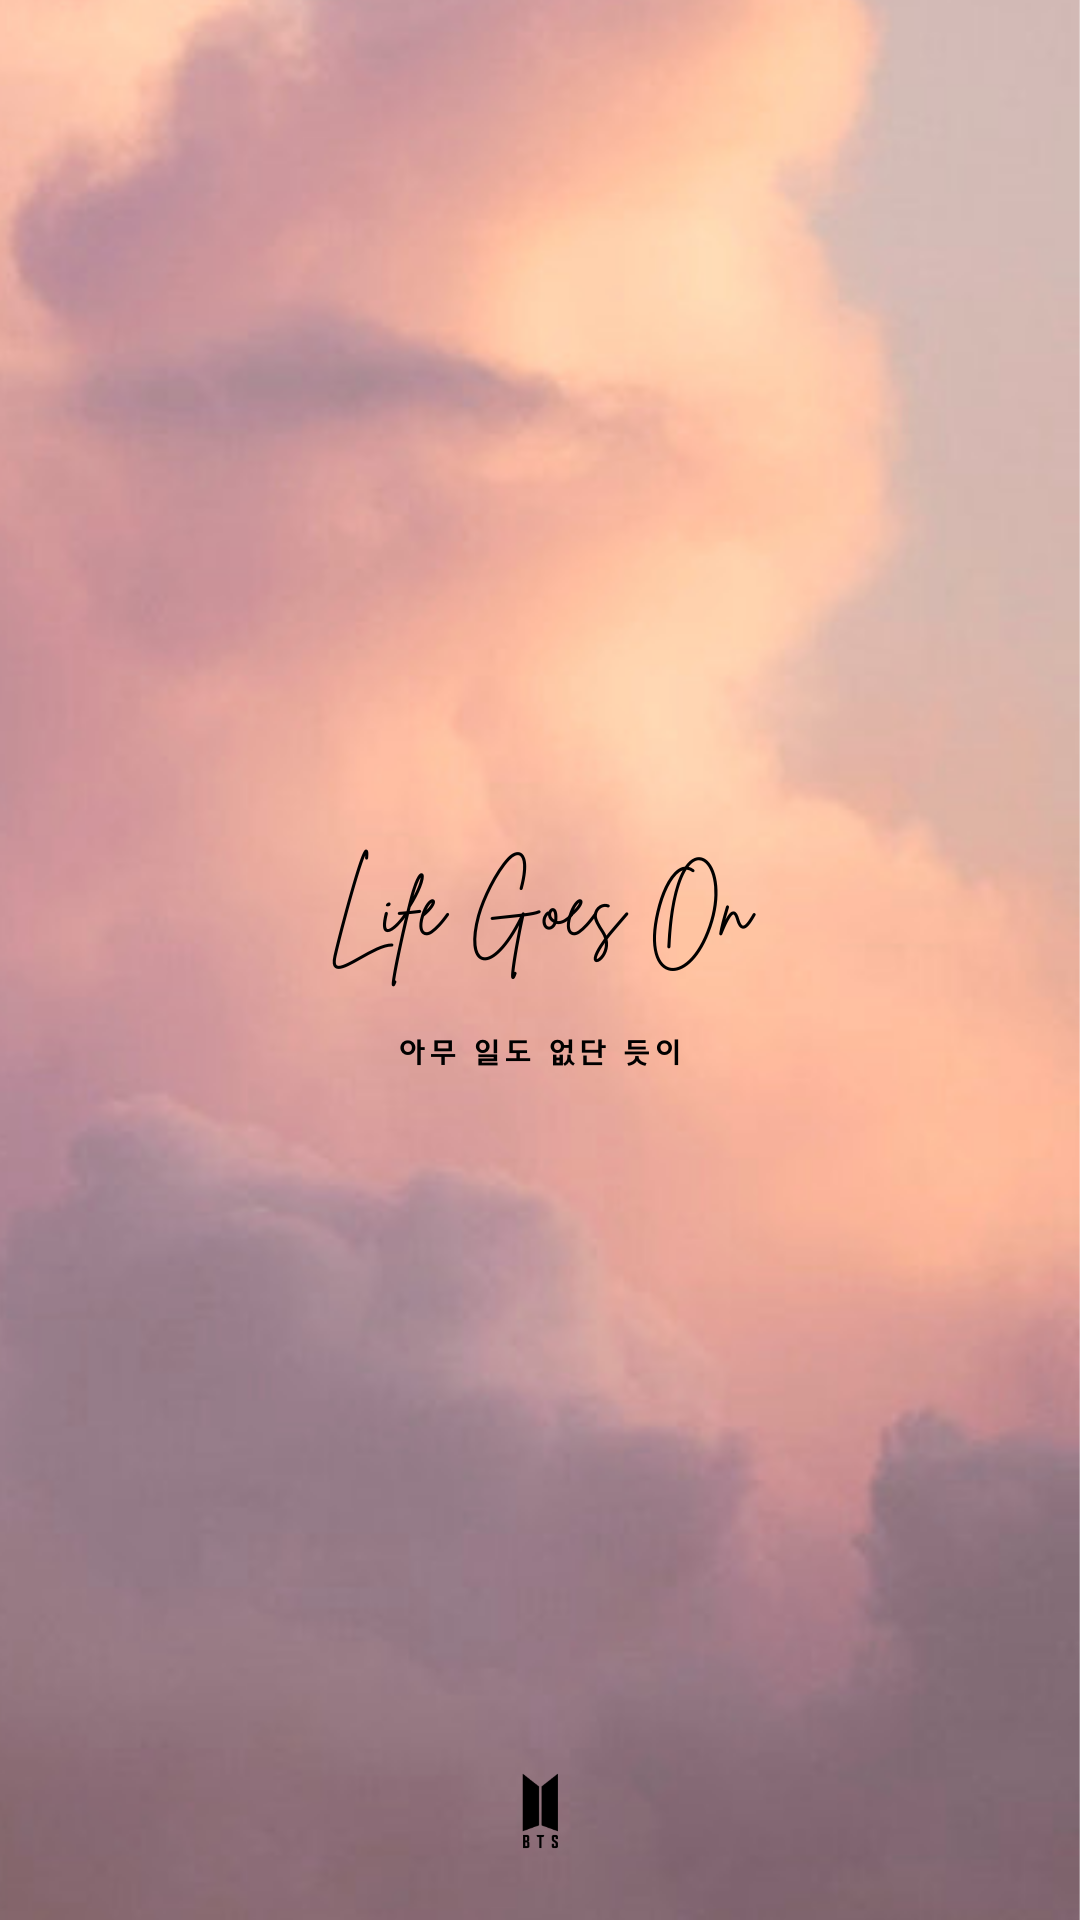 60 BTS Lyrics Wallpaper Options You'll Want to See | Kbeauty Addiction